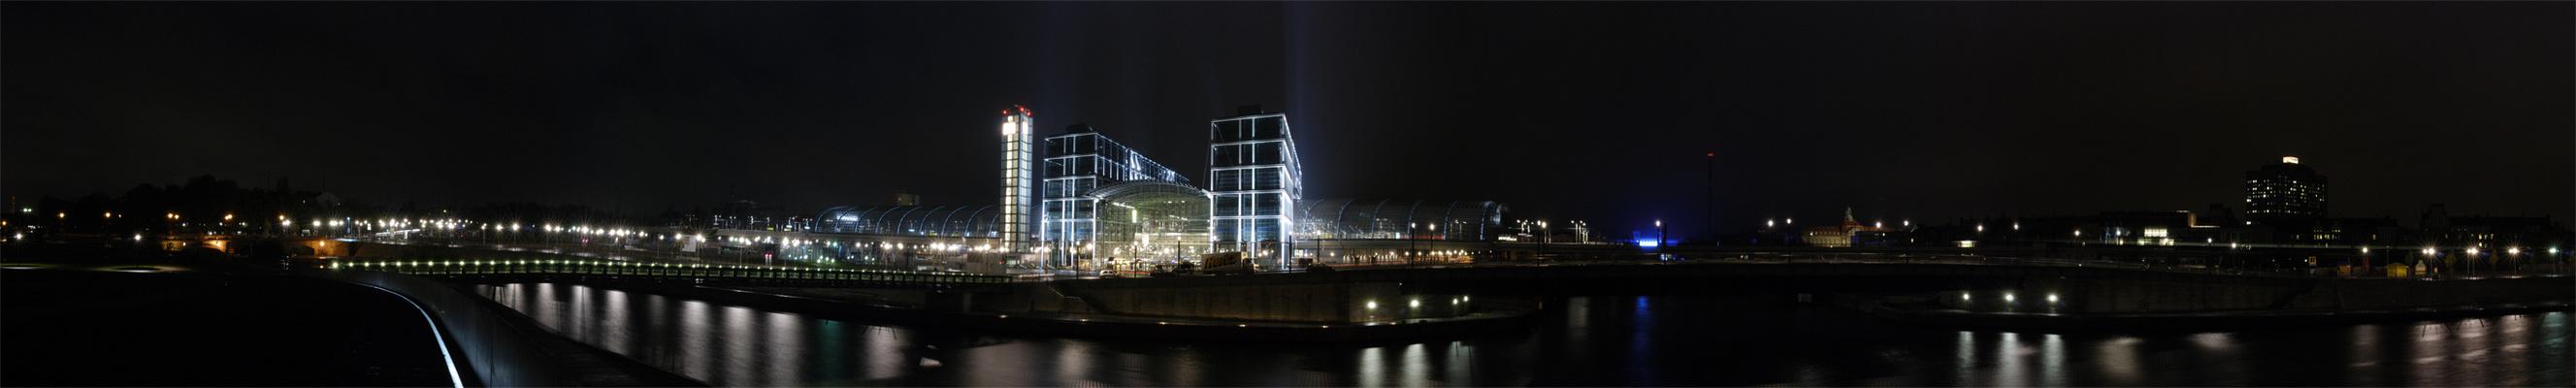 Berlin - Hauptbahnhof im November